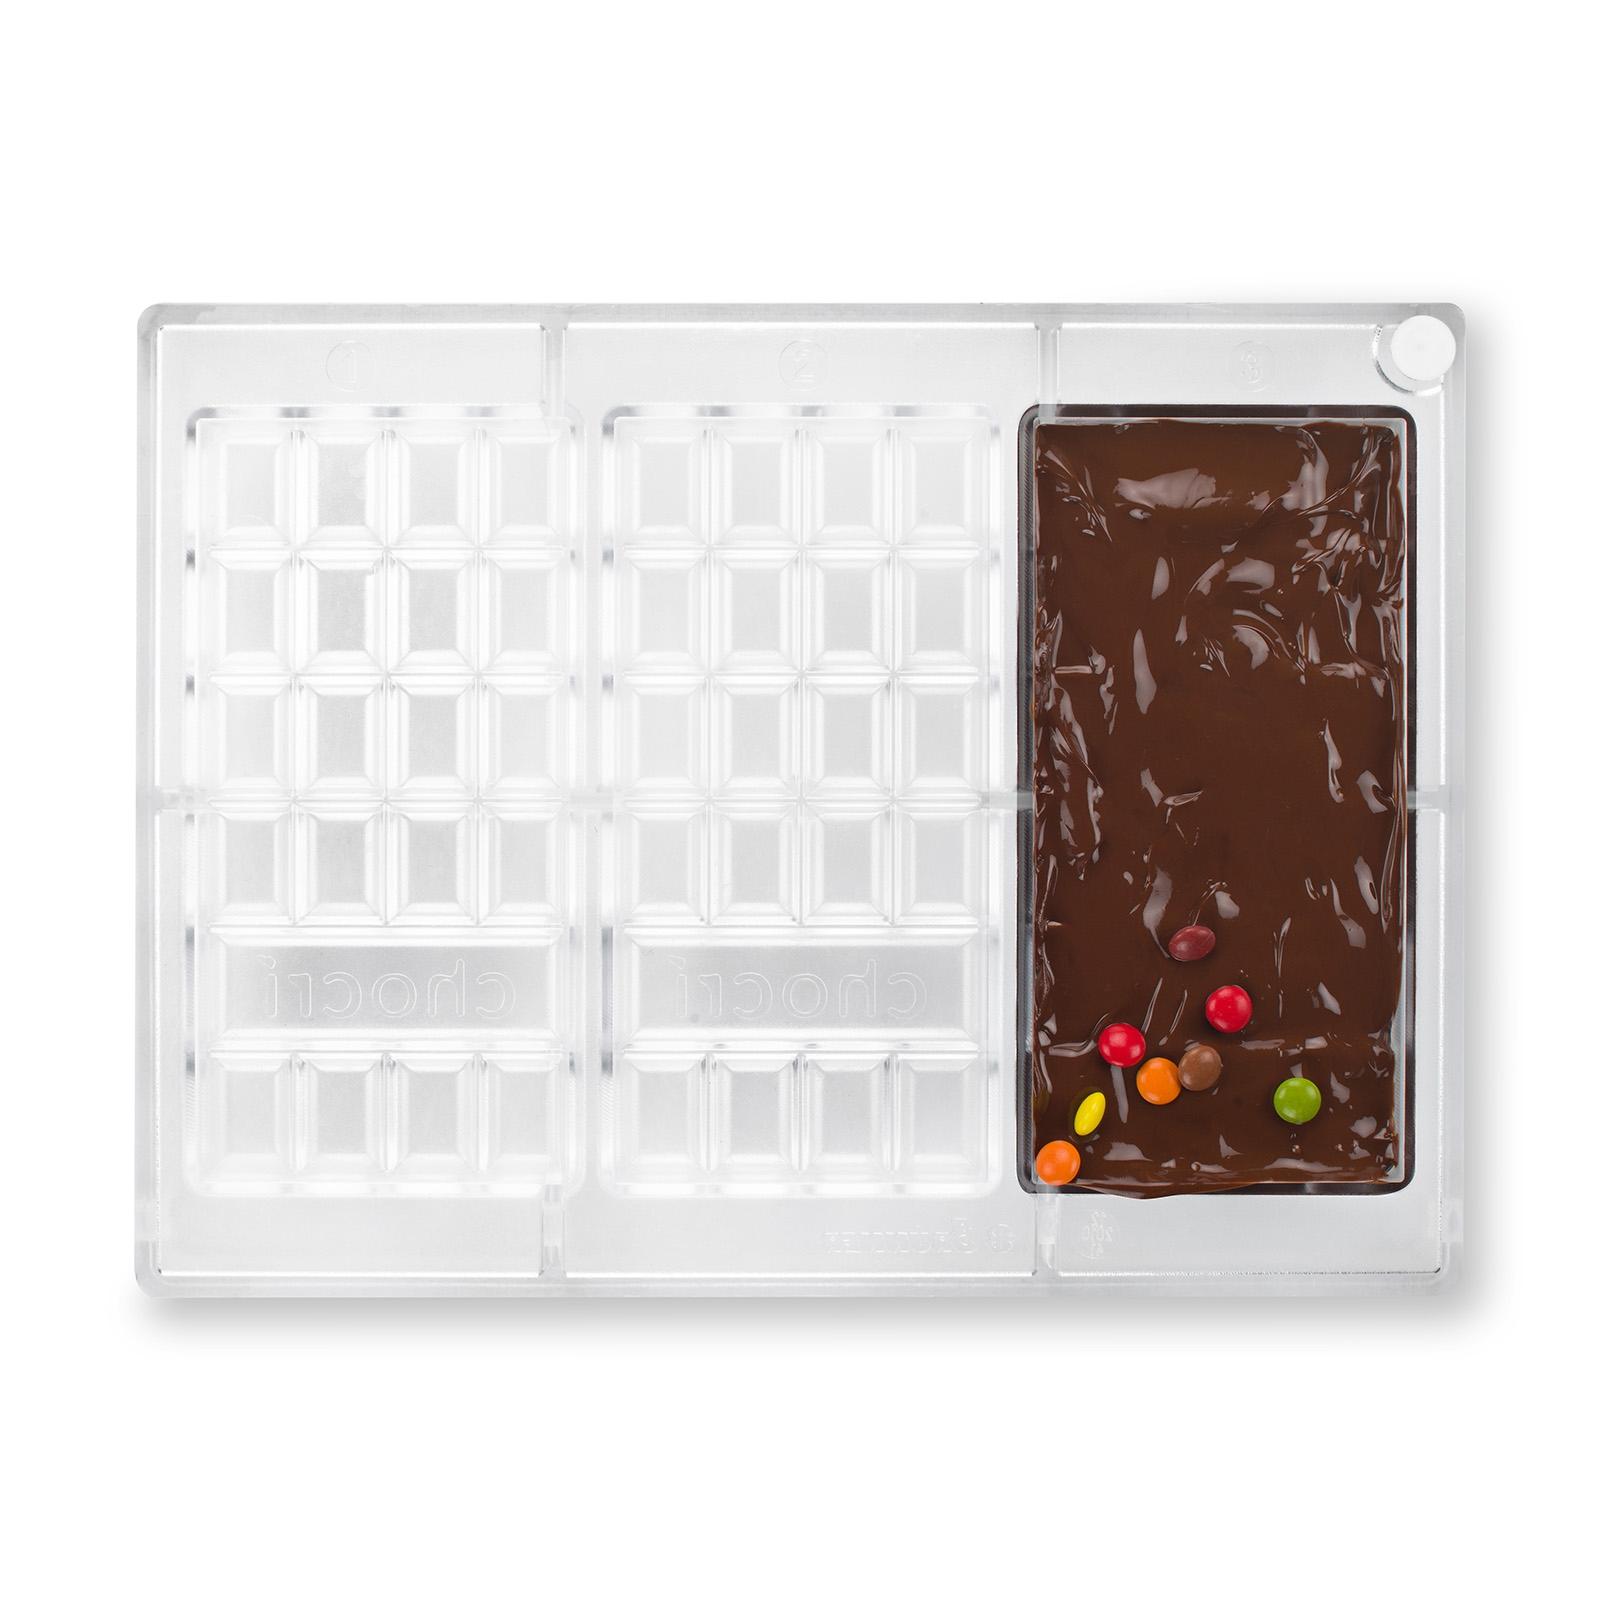 chocri 'Original' Schokoladen-Tafelform